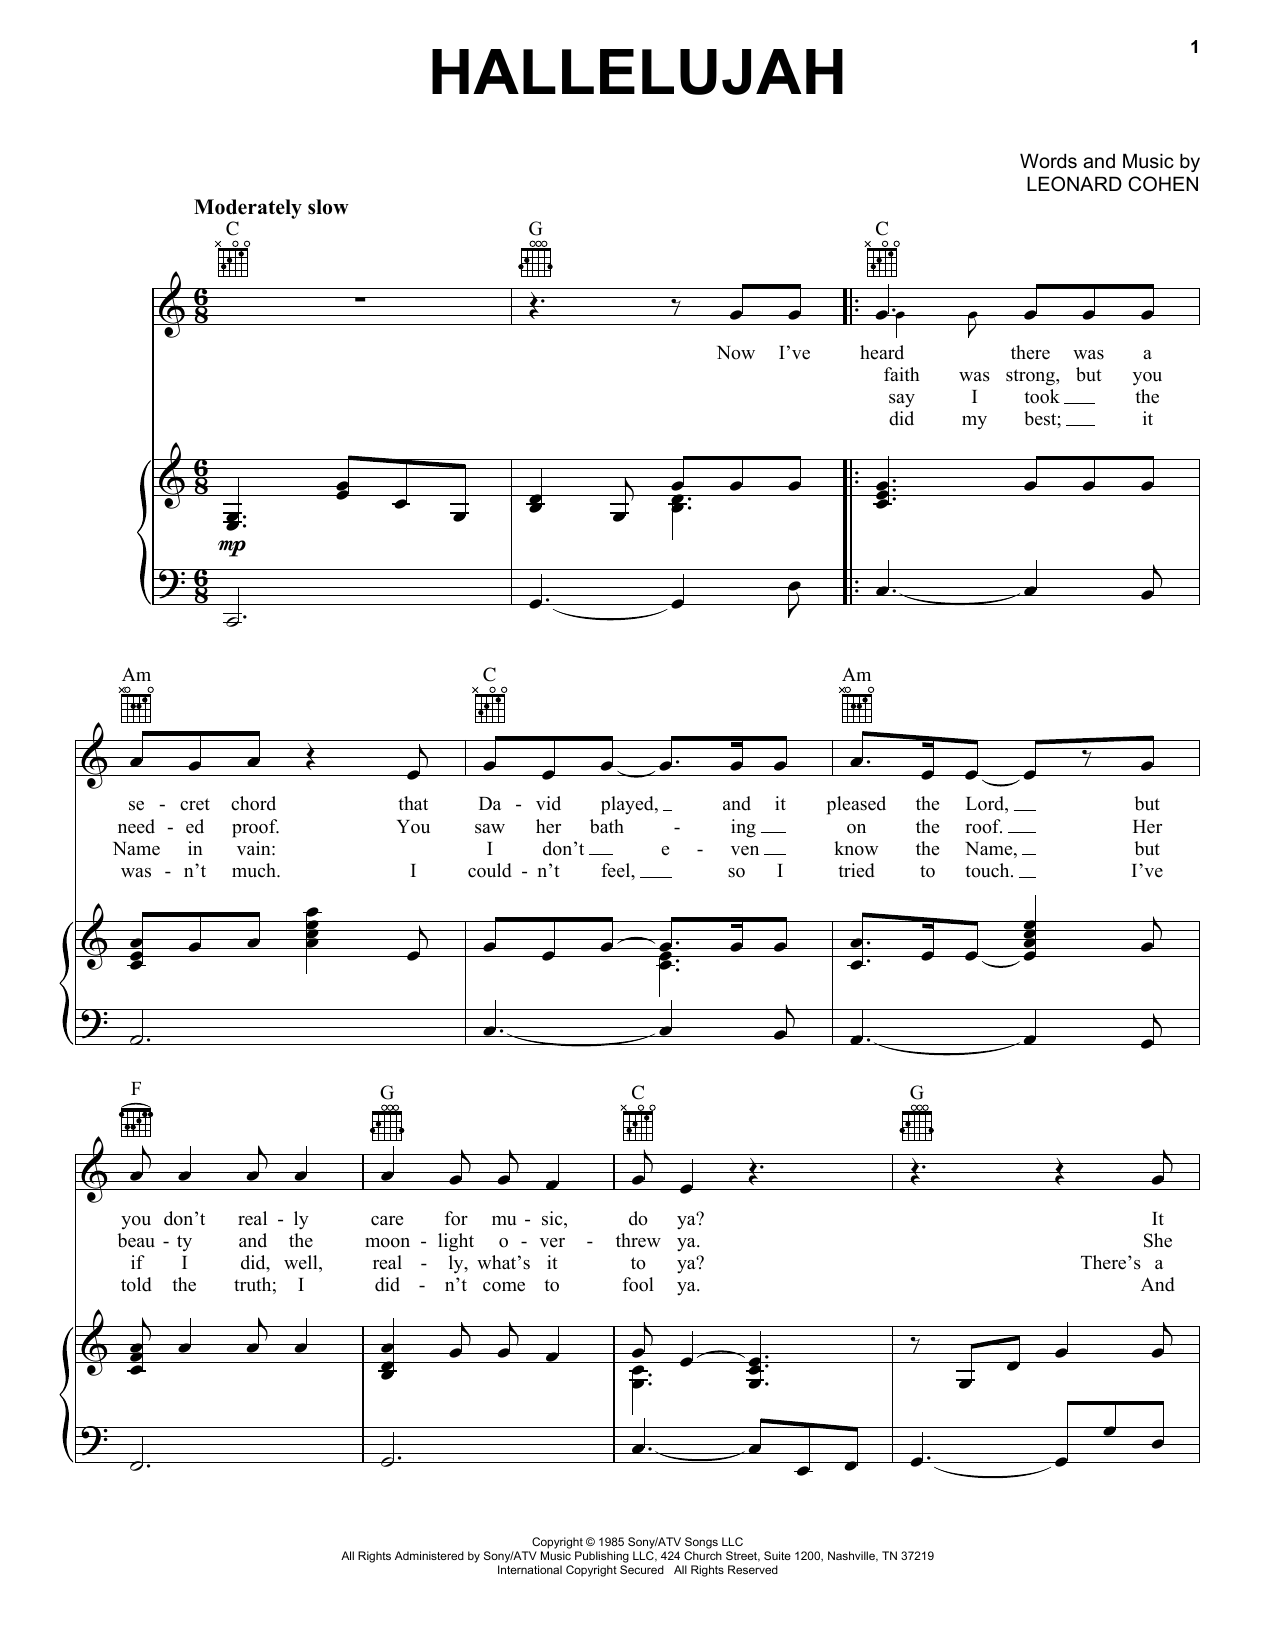 Hallelujah Sheet Music Leonard Cohen Piano Vocal Guitar Right Hand Melody Hallelujah Sheet Music Sheet Music Easy Piano Sheet Music